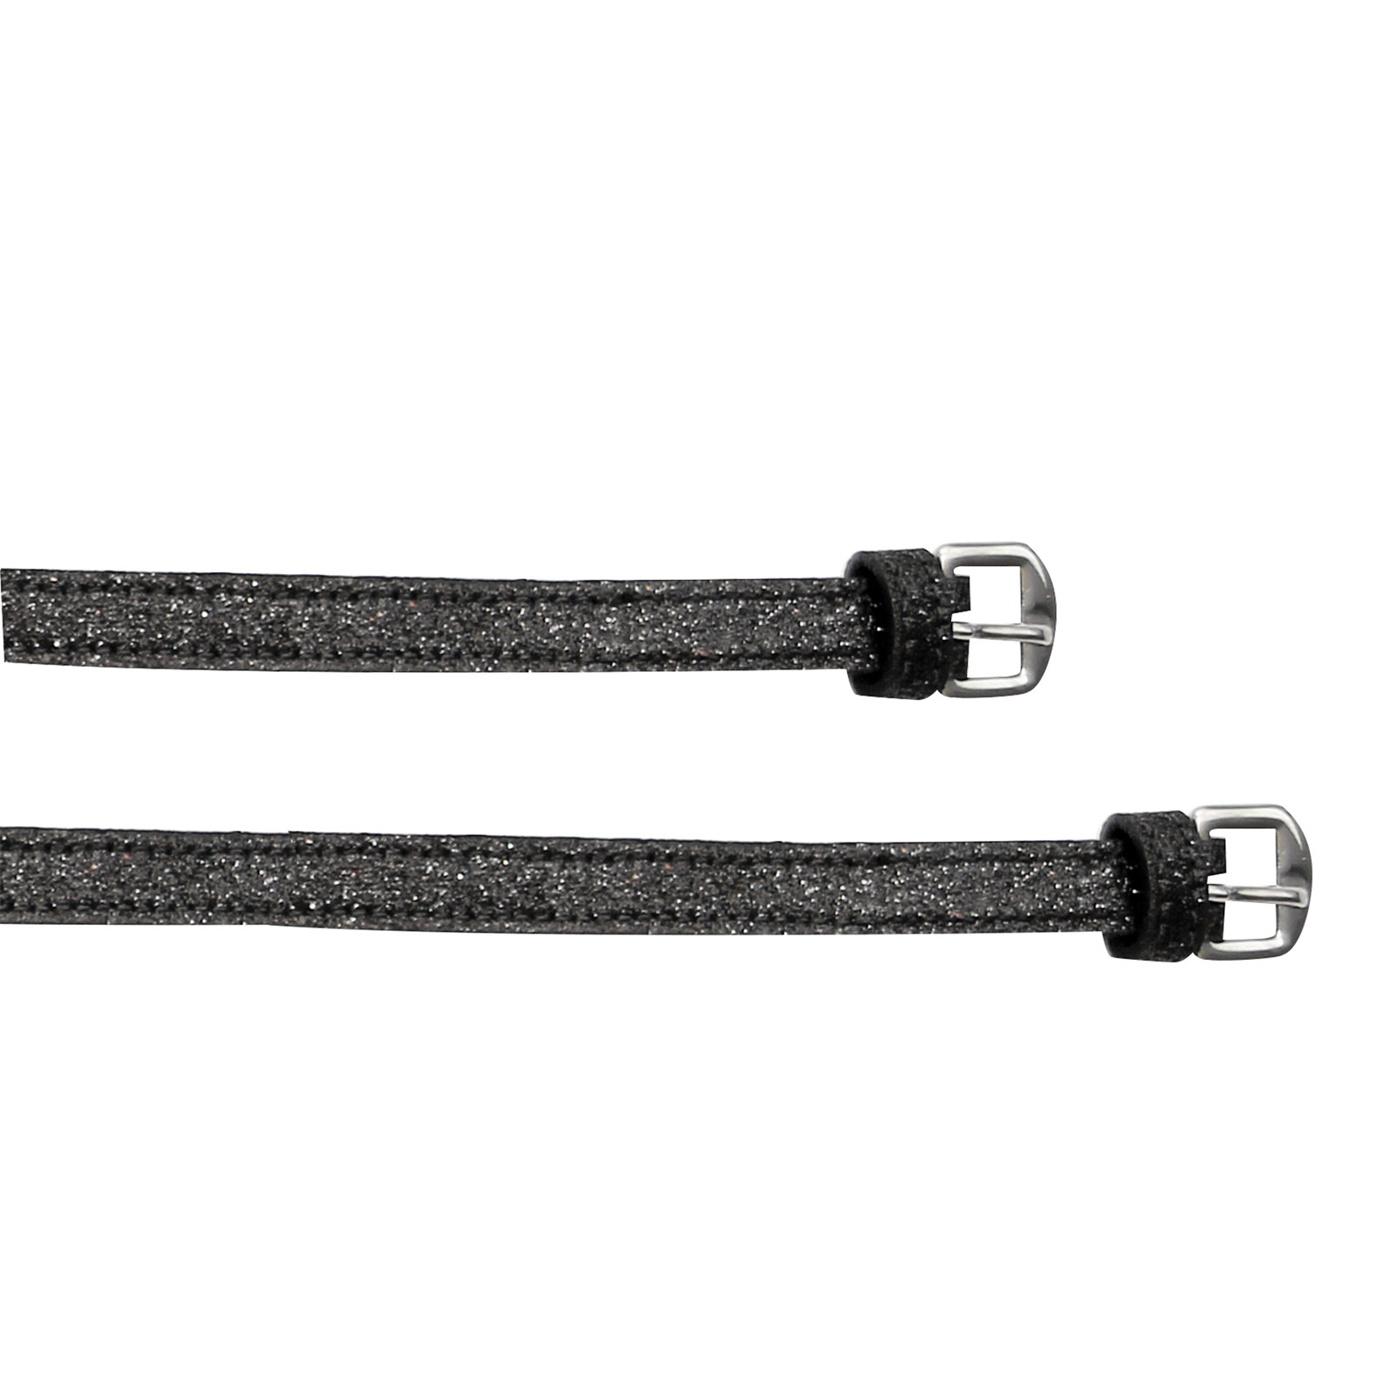 spur-straps-shine-close